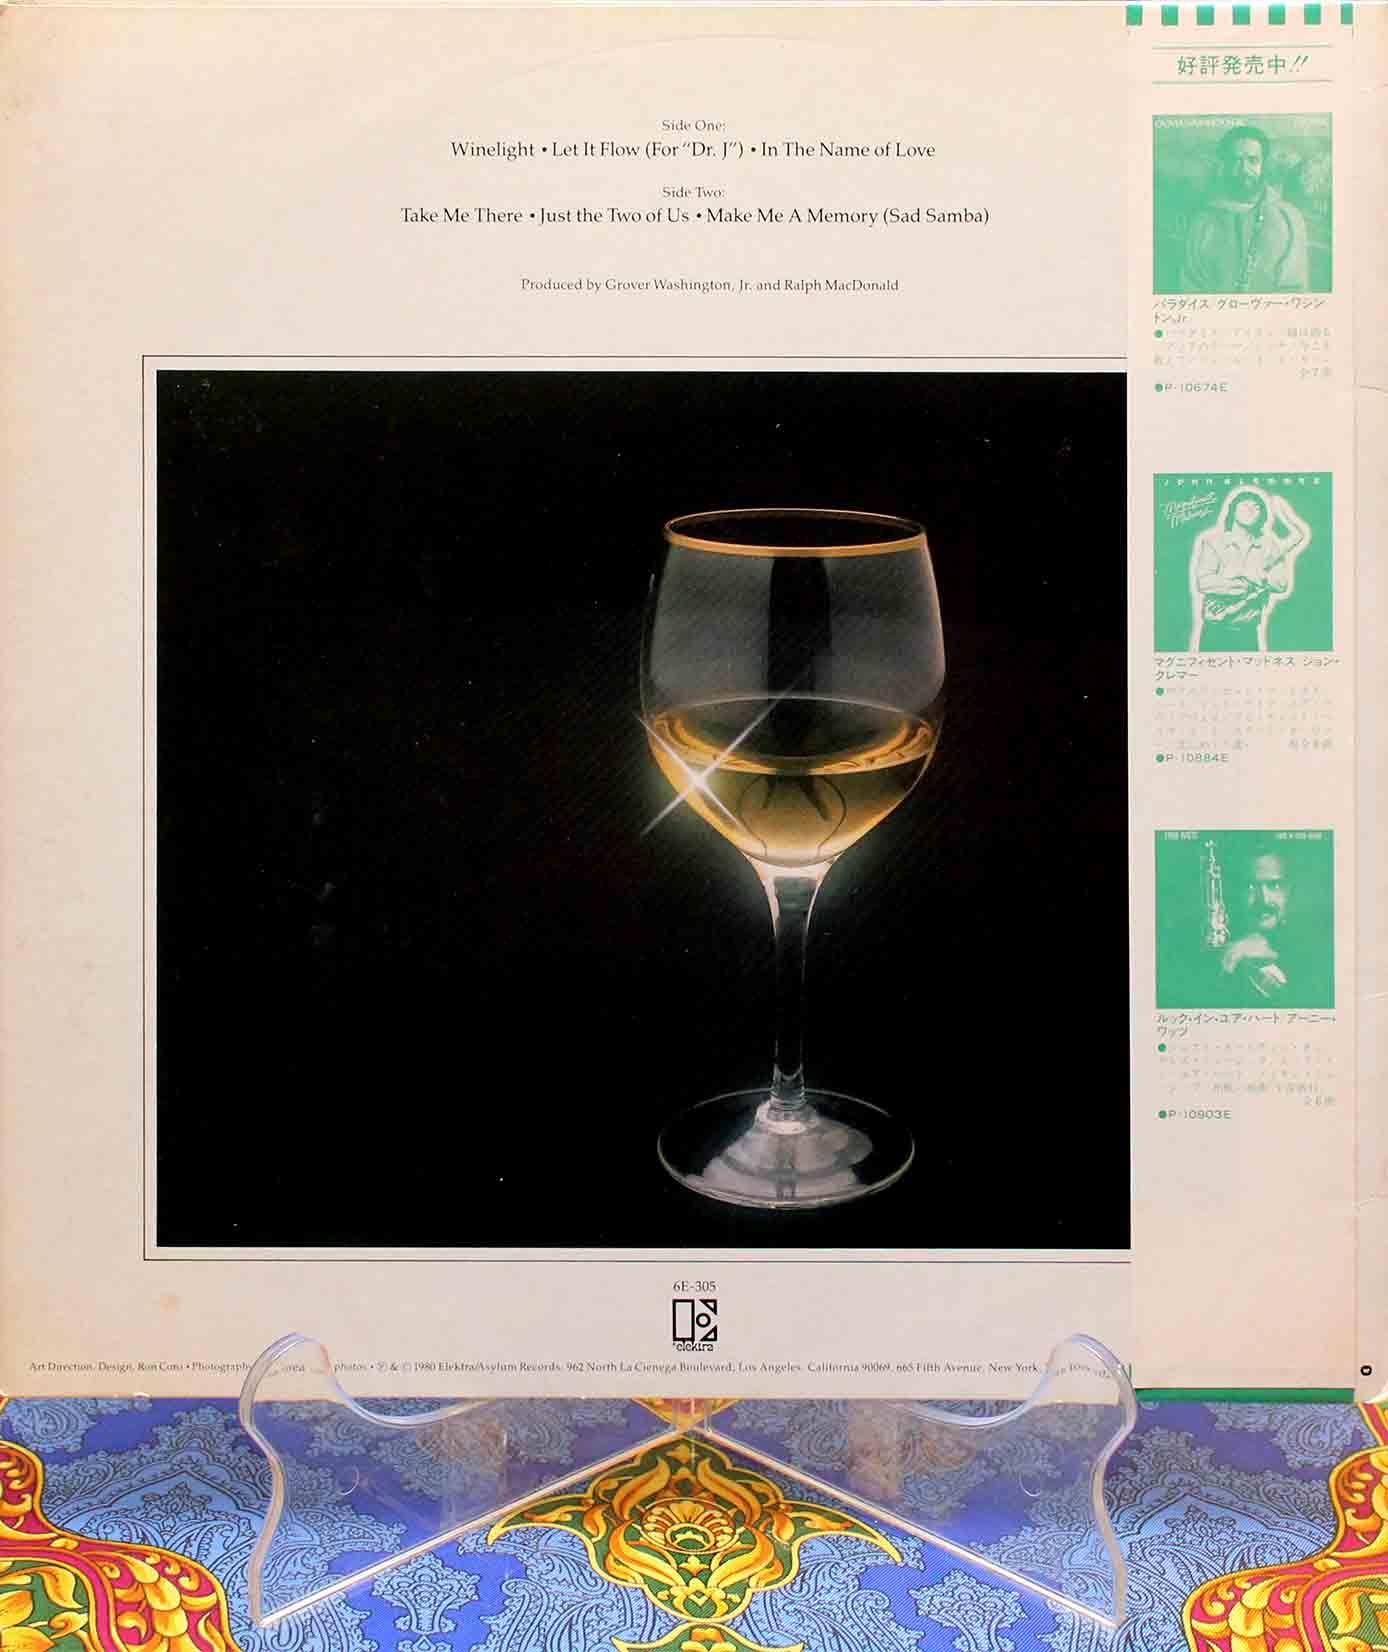 Grover Washington, Jr - Winelight LP 02